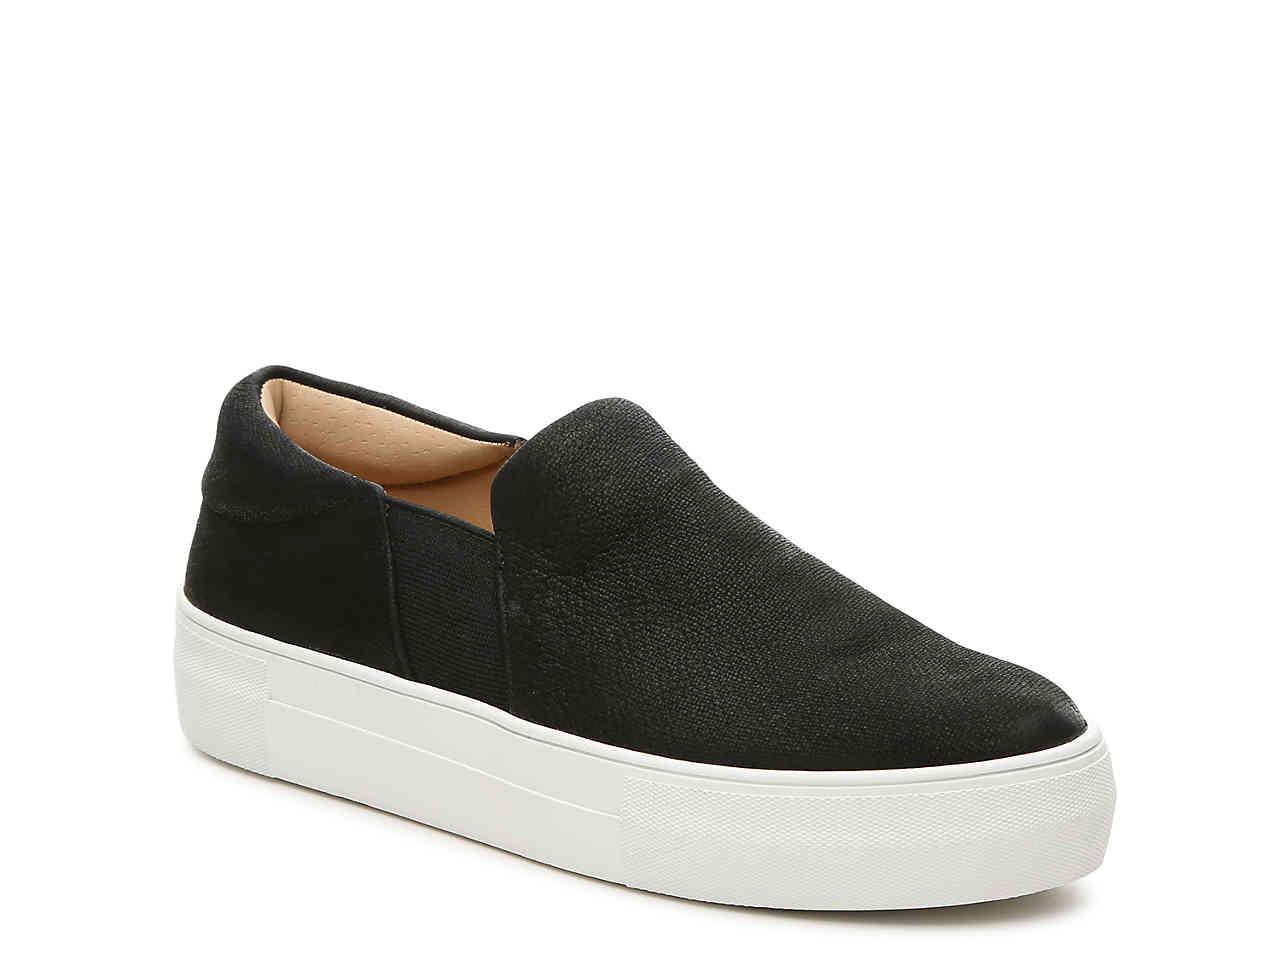 Vince Camuto Kaylinn Slip-on Sneaker in